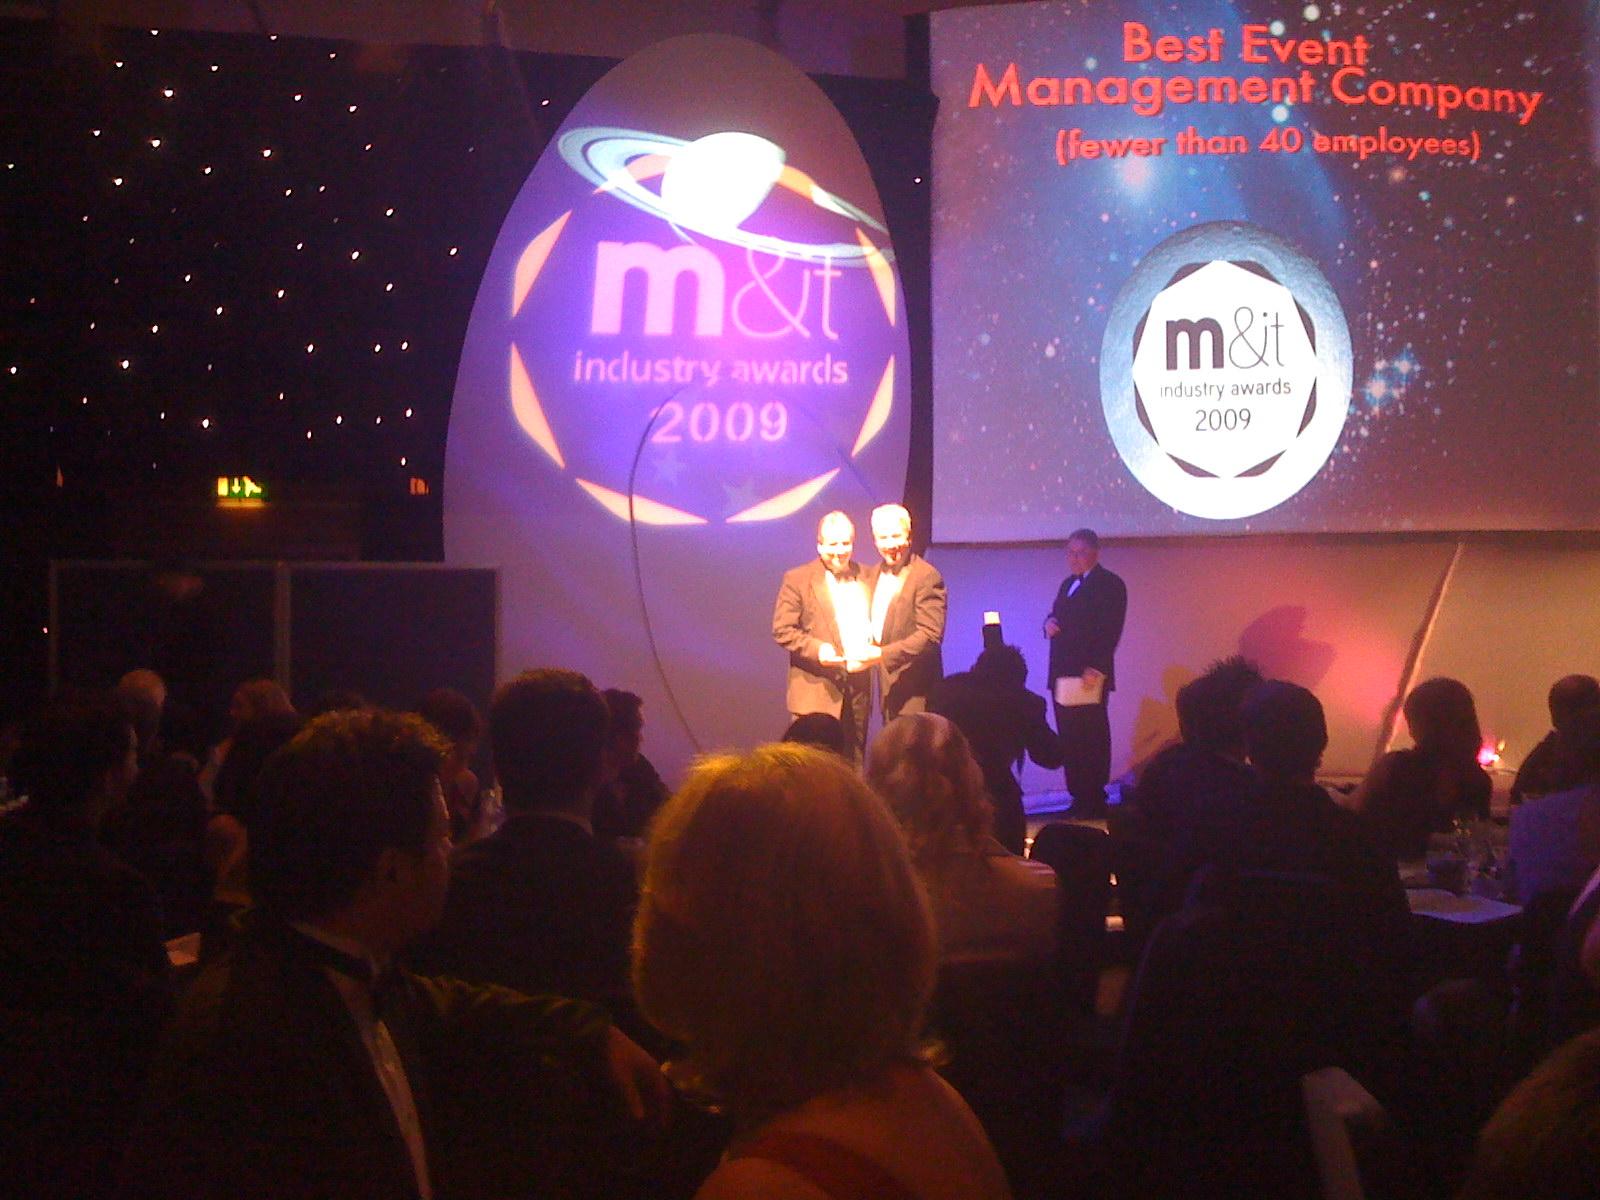 MIT Awards